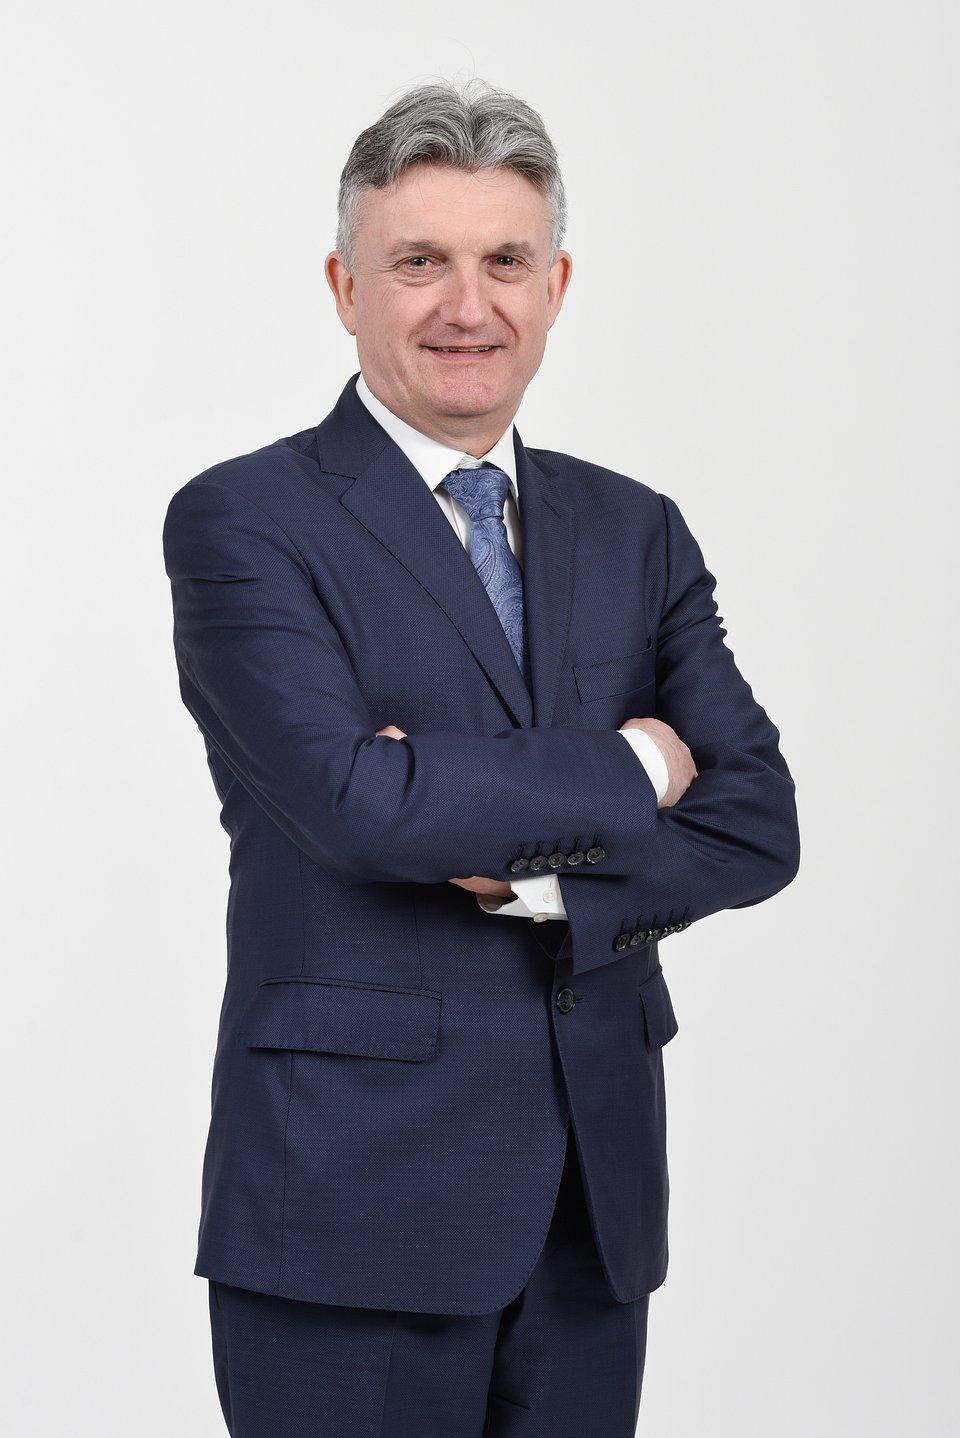 Piotr Rusinek